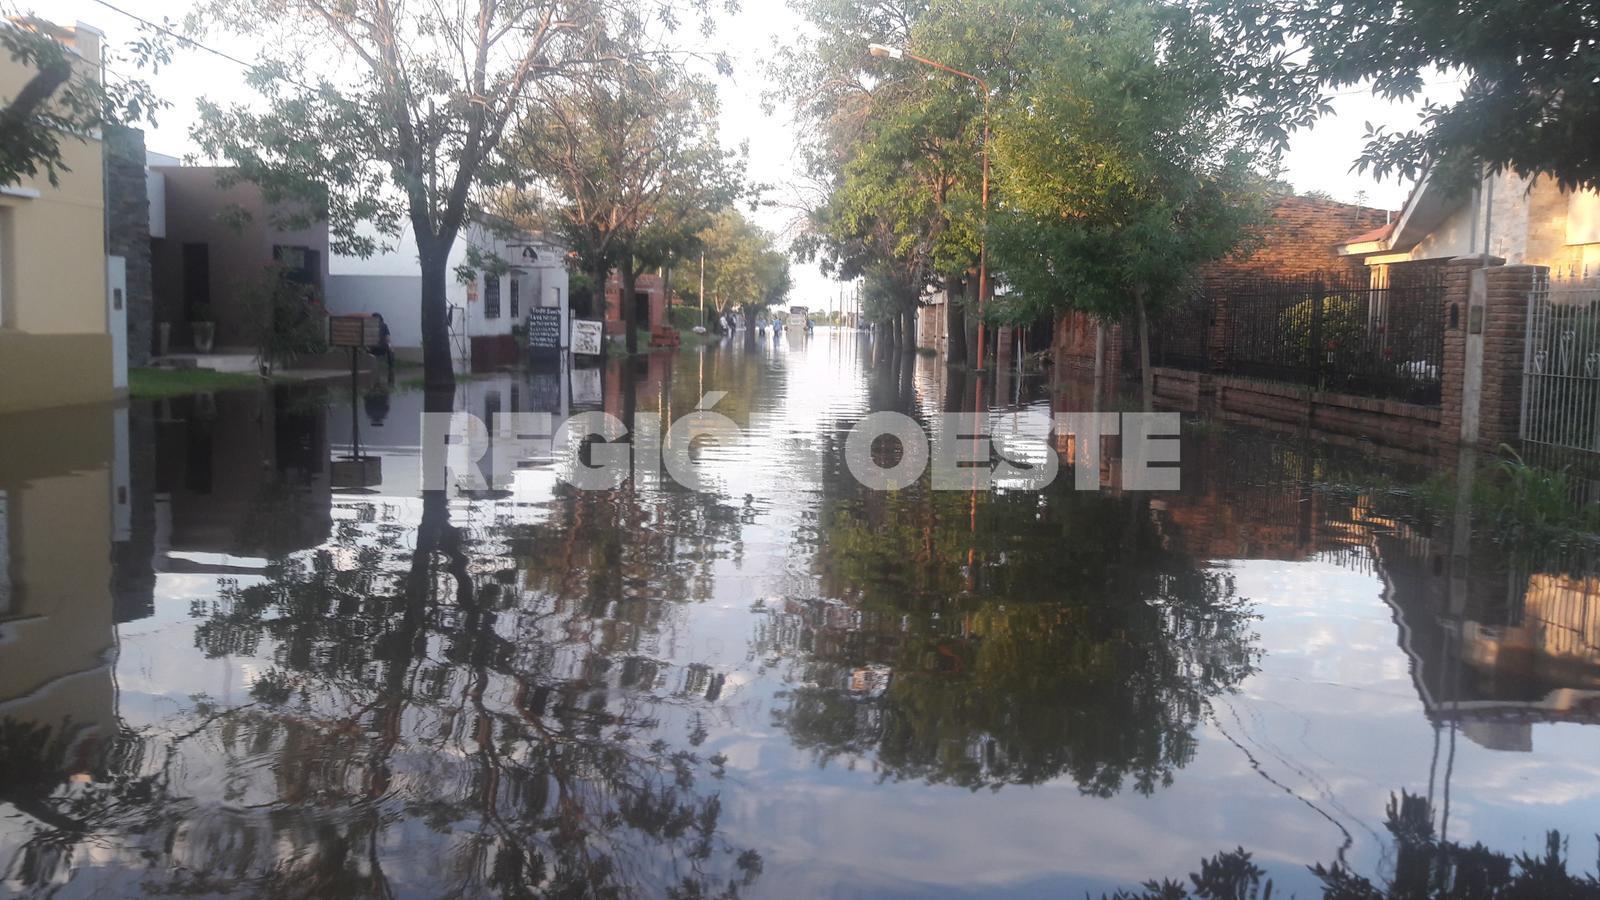 Inundación en Ramona